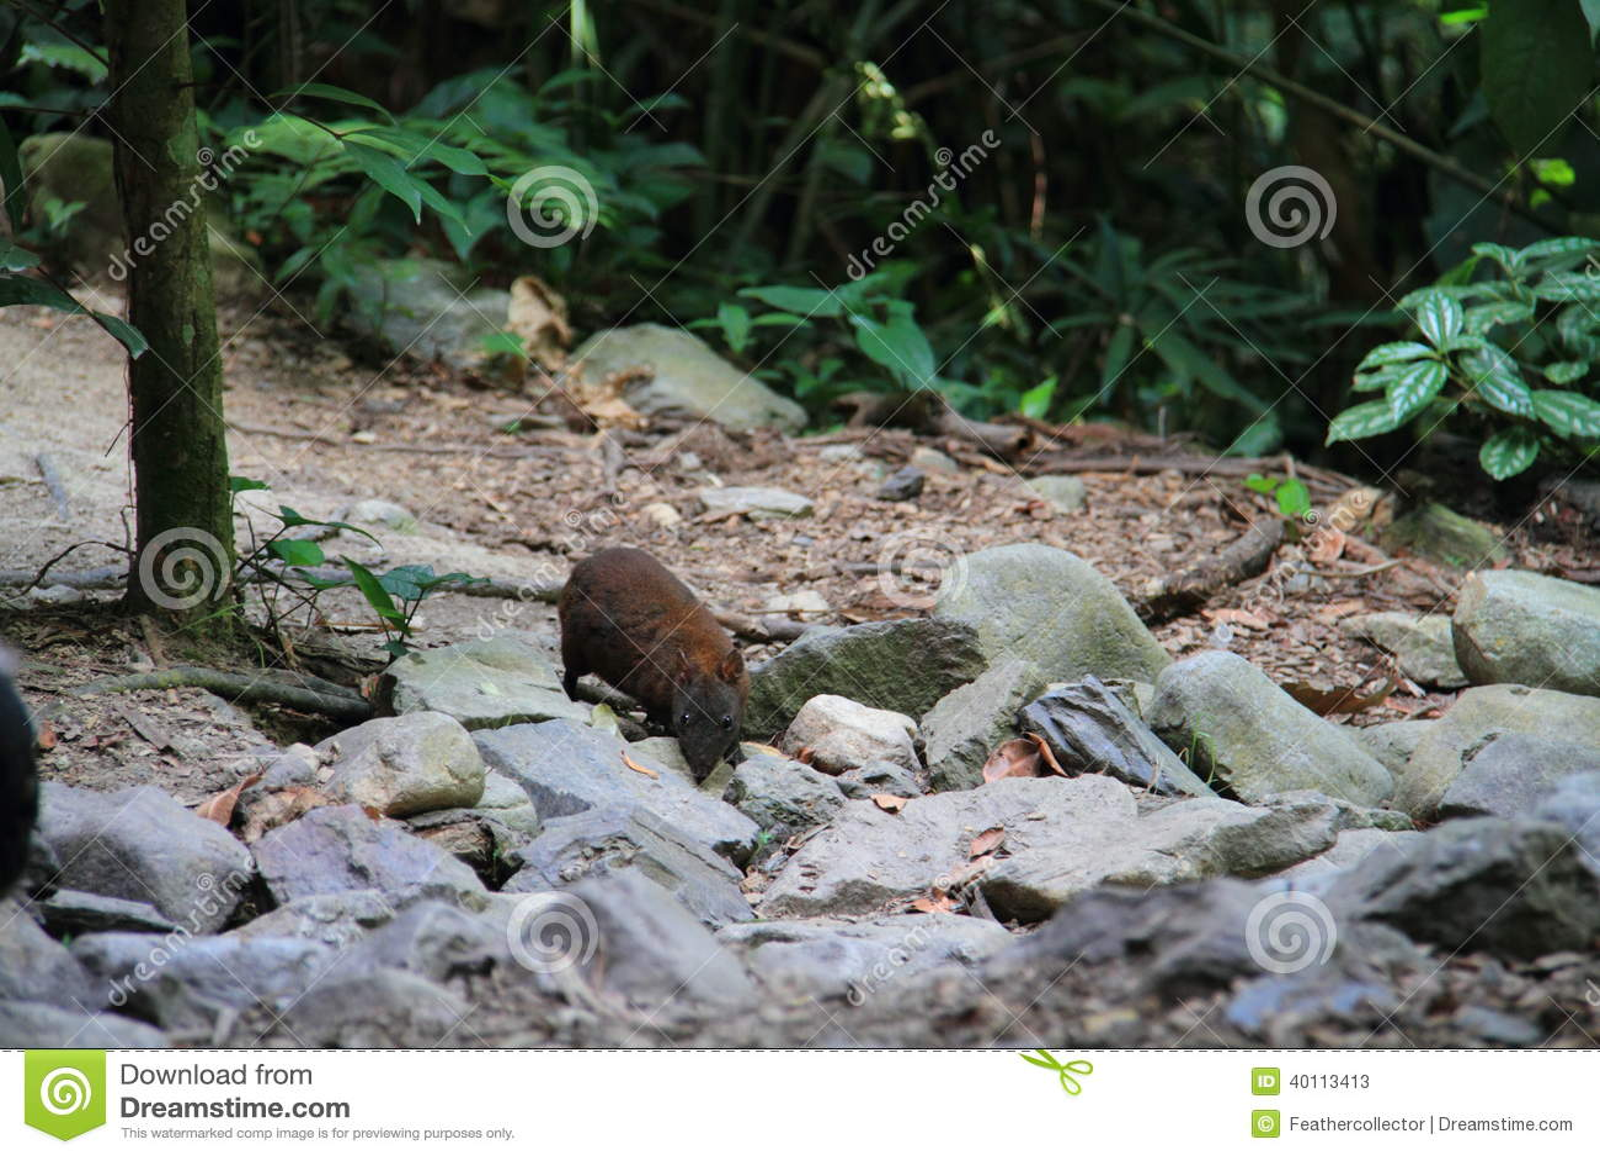 Moschusartiger Ratte-Känguru